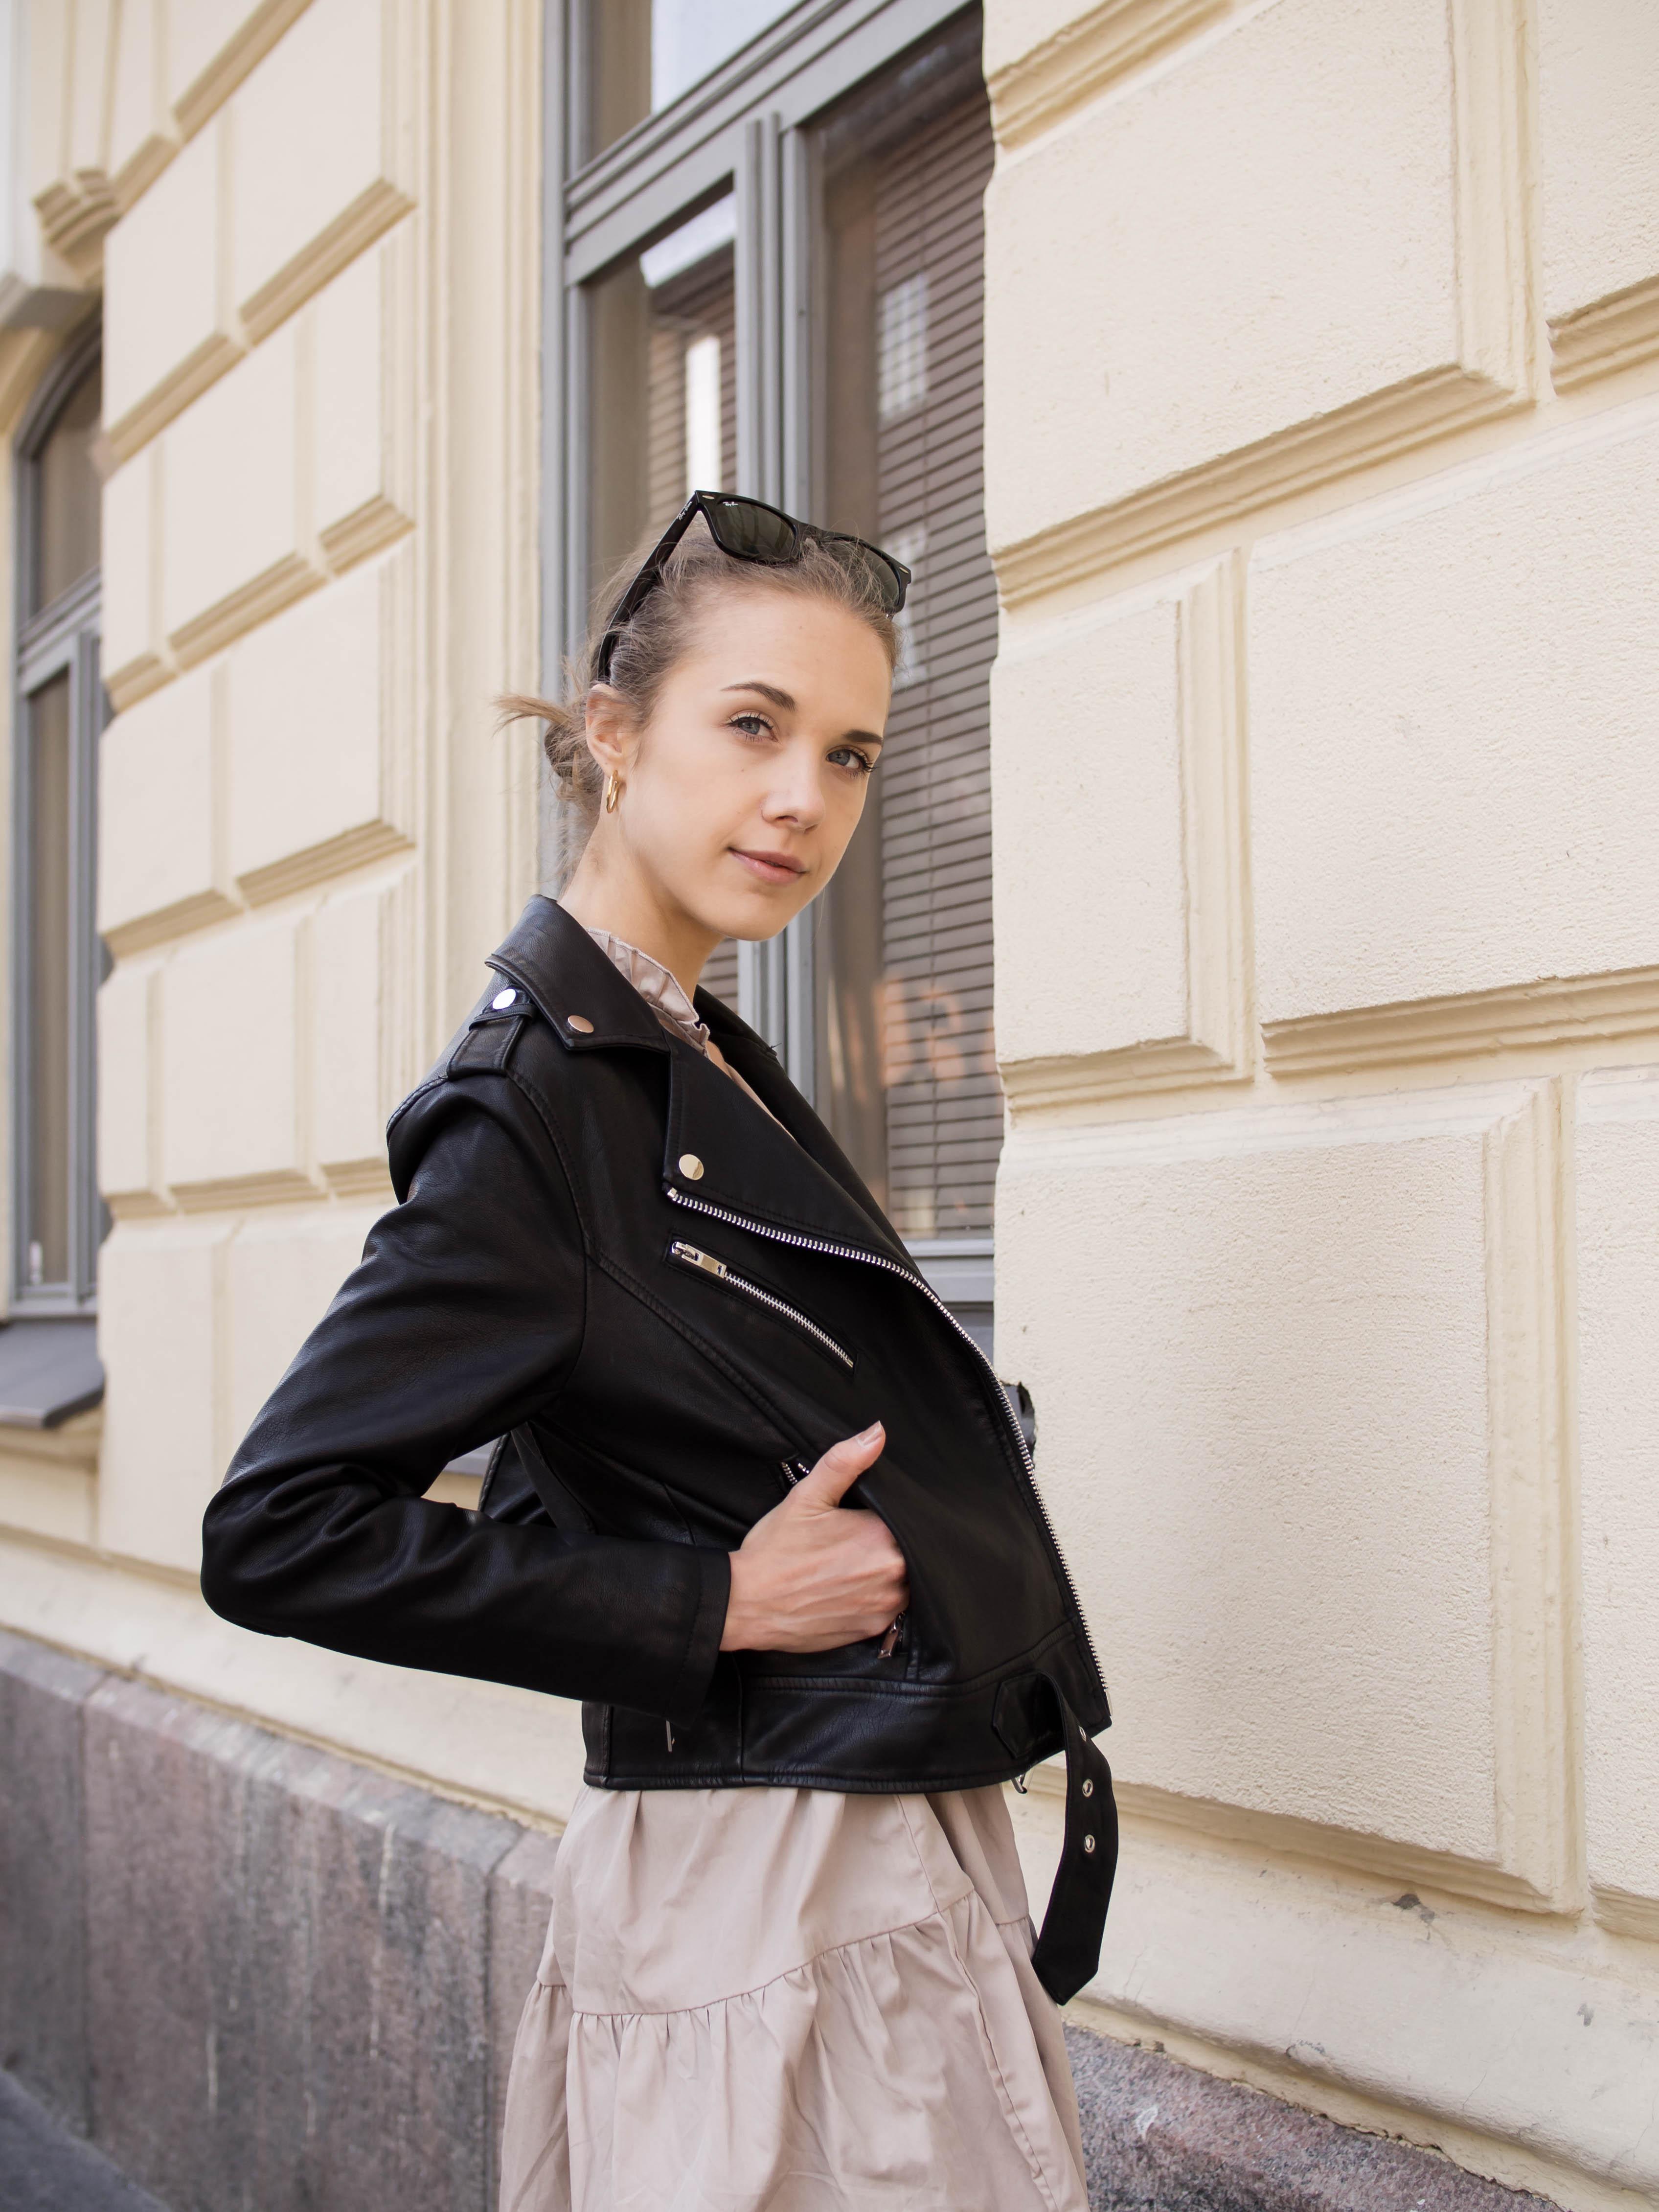 Saint Laurent inspired street style - Saint Laurent inspiraatio, muoti